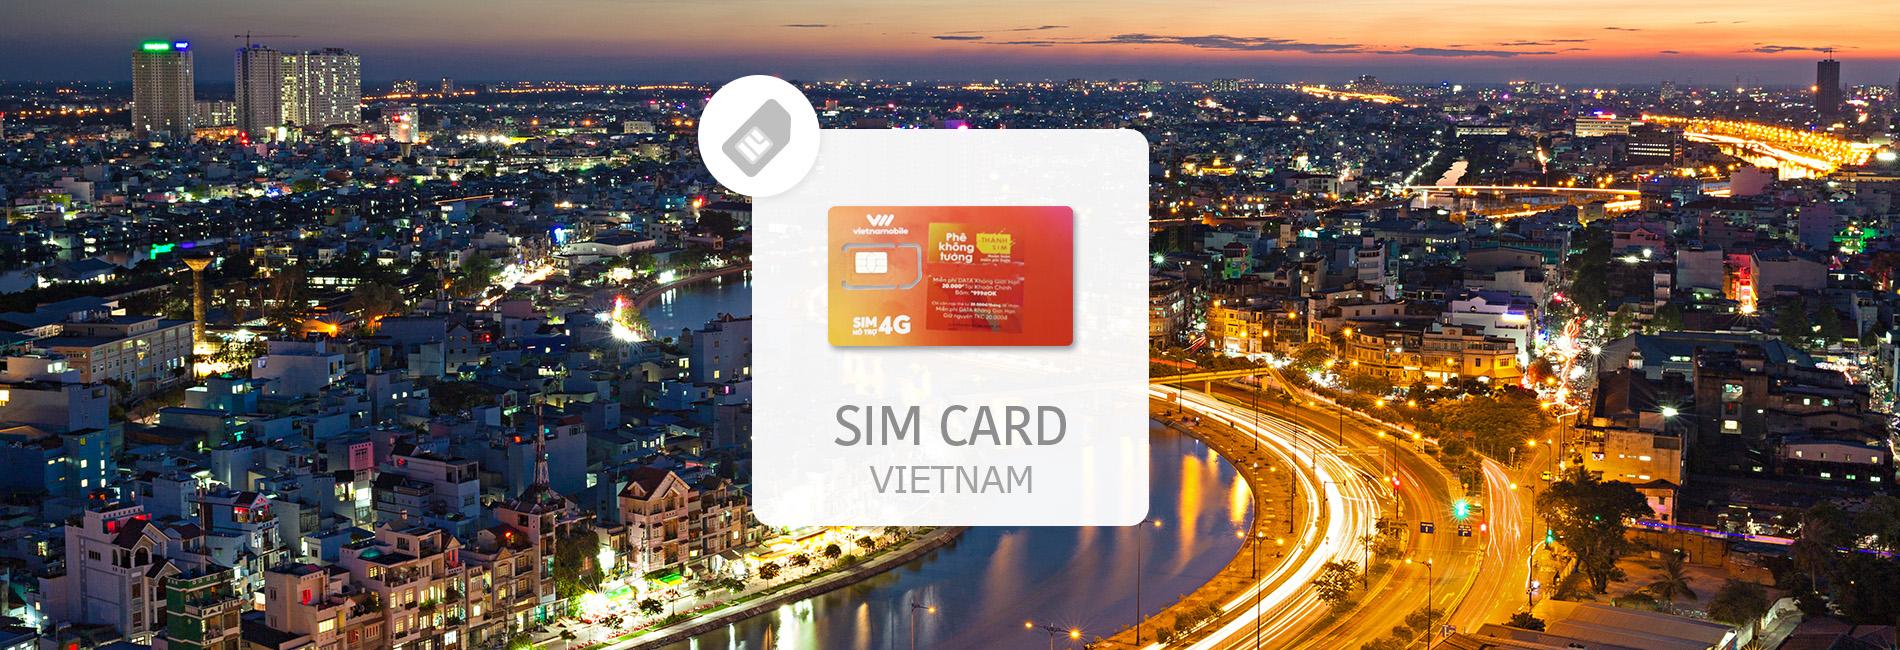 Vietnam 3G SIM Card (Pick-Up in Tan Son Nhat International Airport)